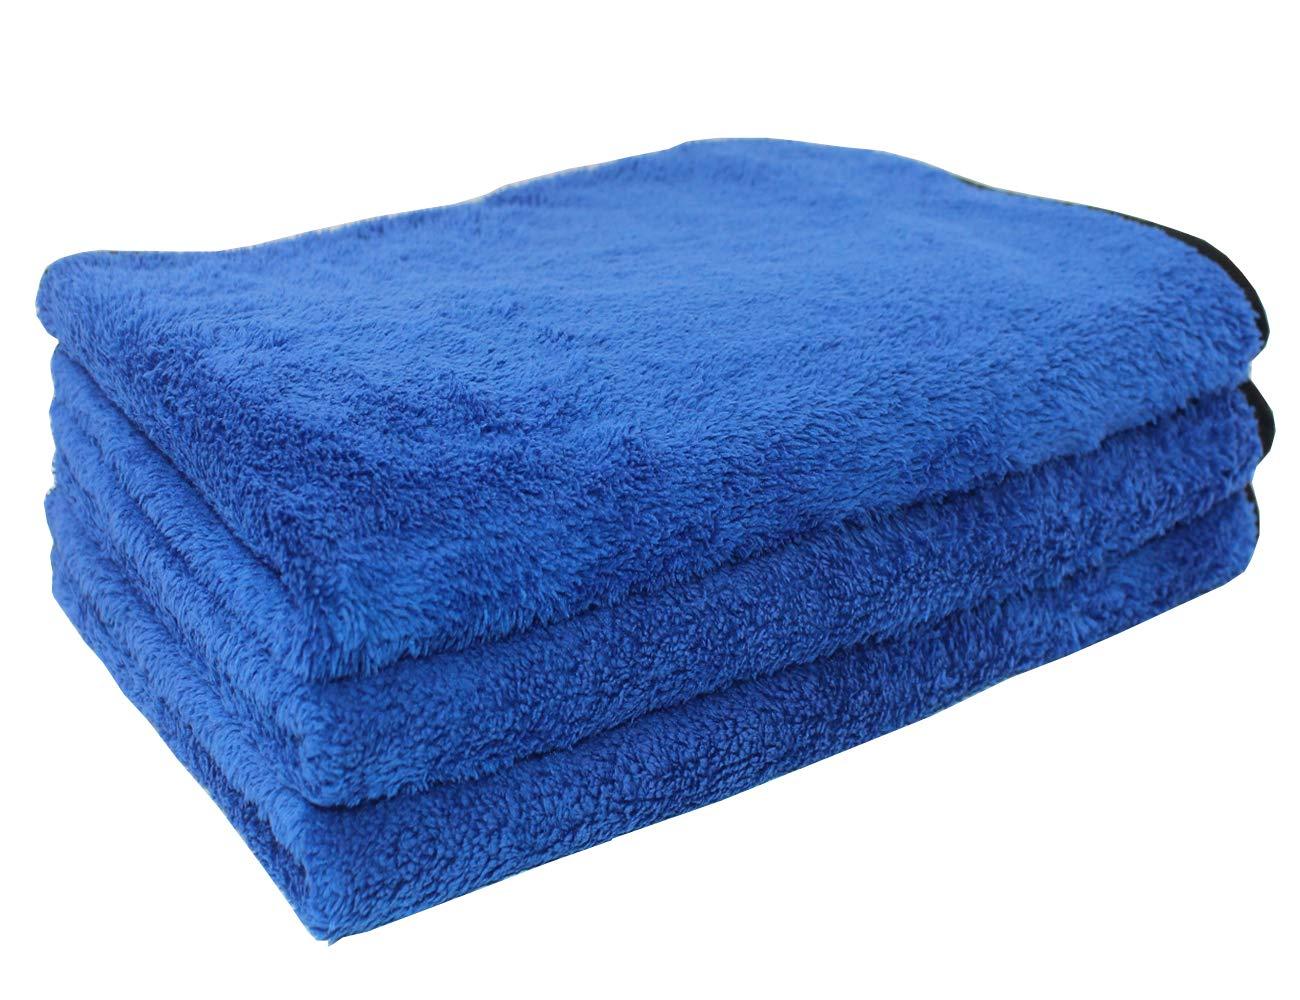 HIDMD Panni in Microfibra Asciugamani per Asciugatura Auto Panno Microfibra per Pulizia Panno Asciugatura Panno per Lucidatura Set 3 Pezzi 40cm x 60cm Grigio